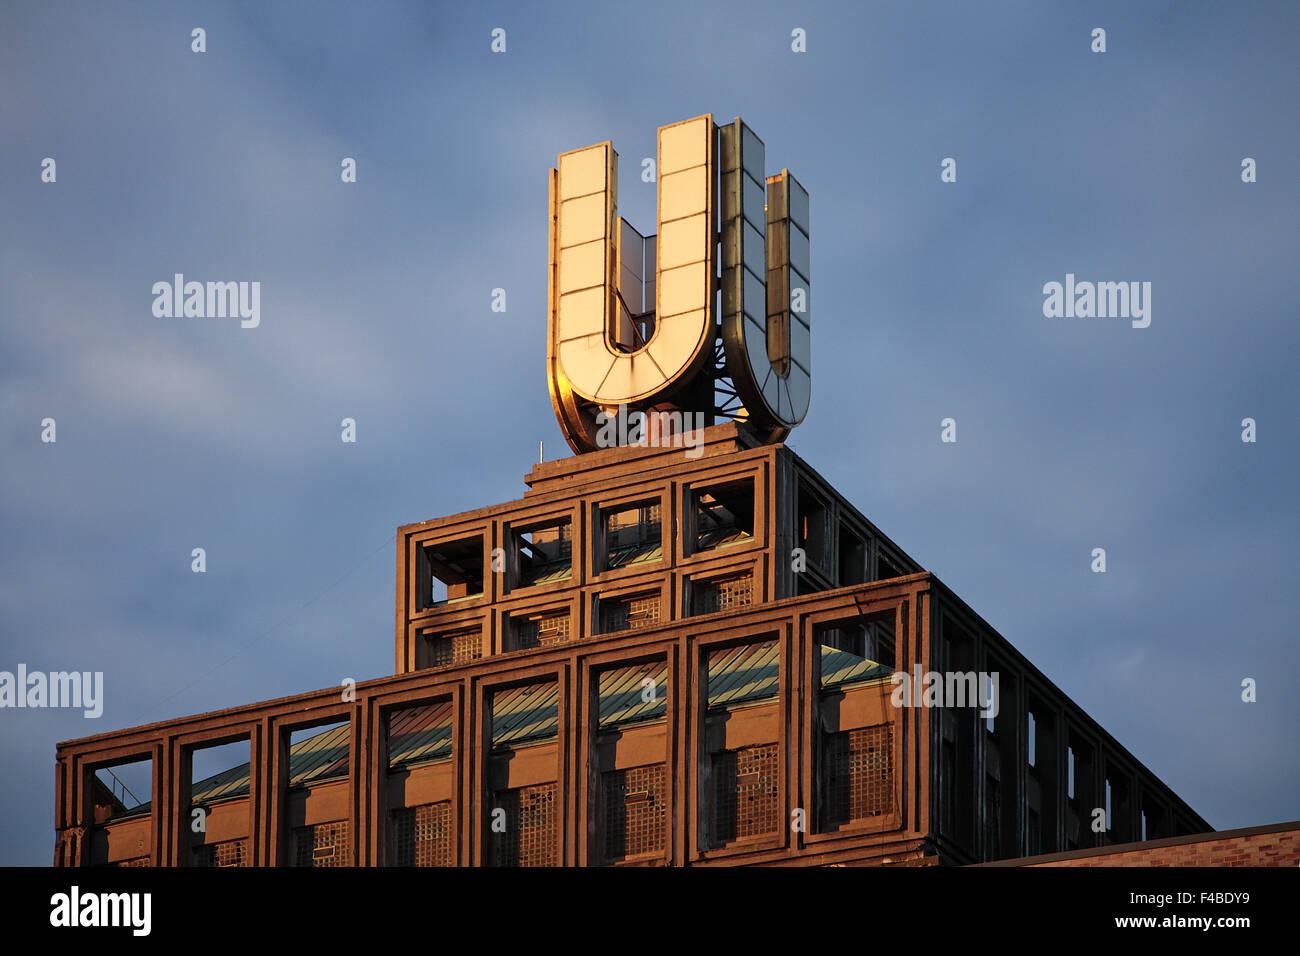 U, Dortmund, Germany. - Stock Image